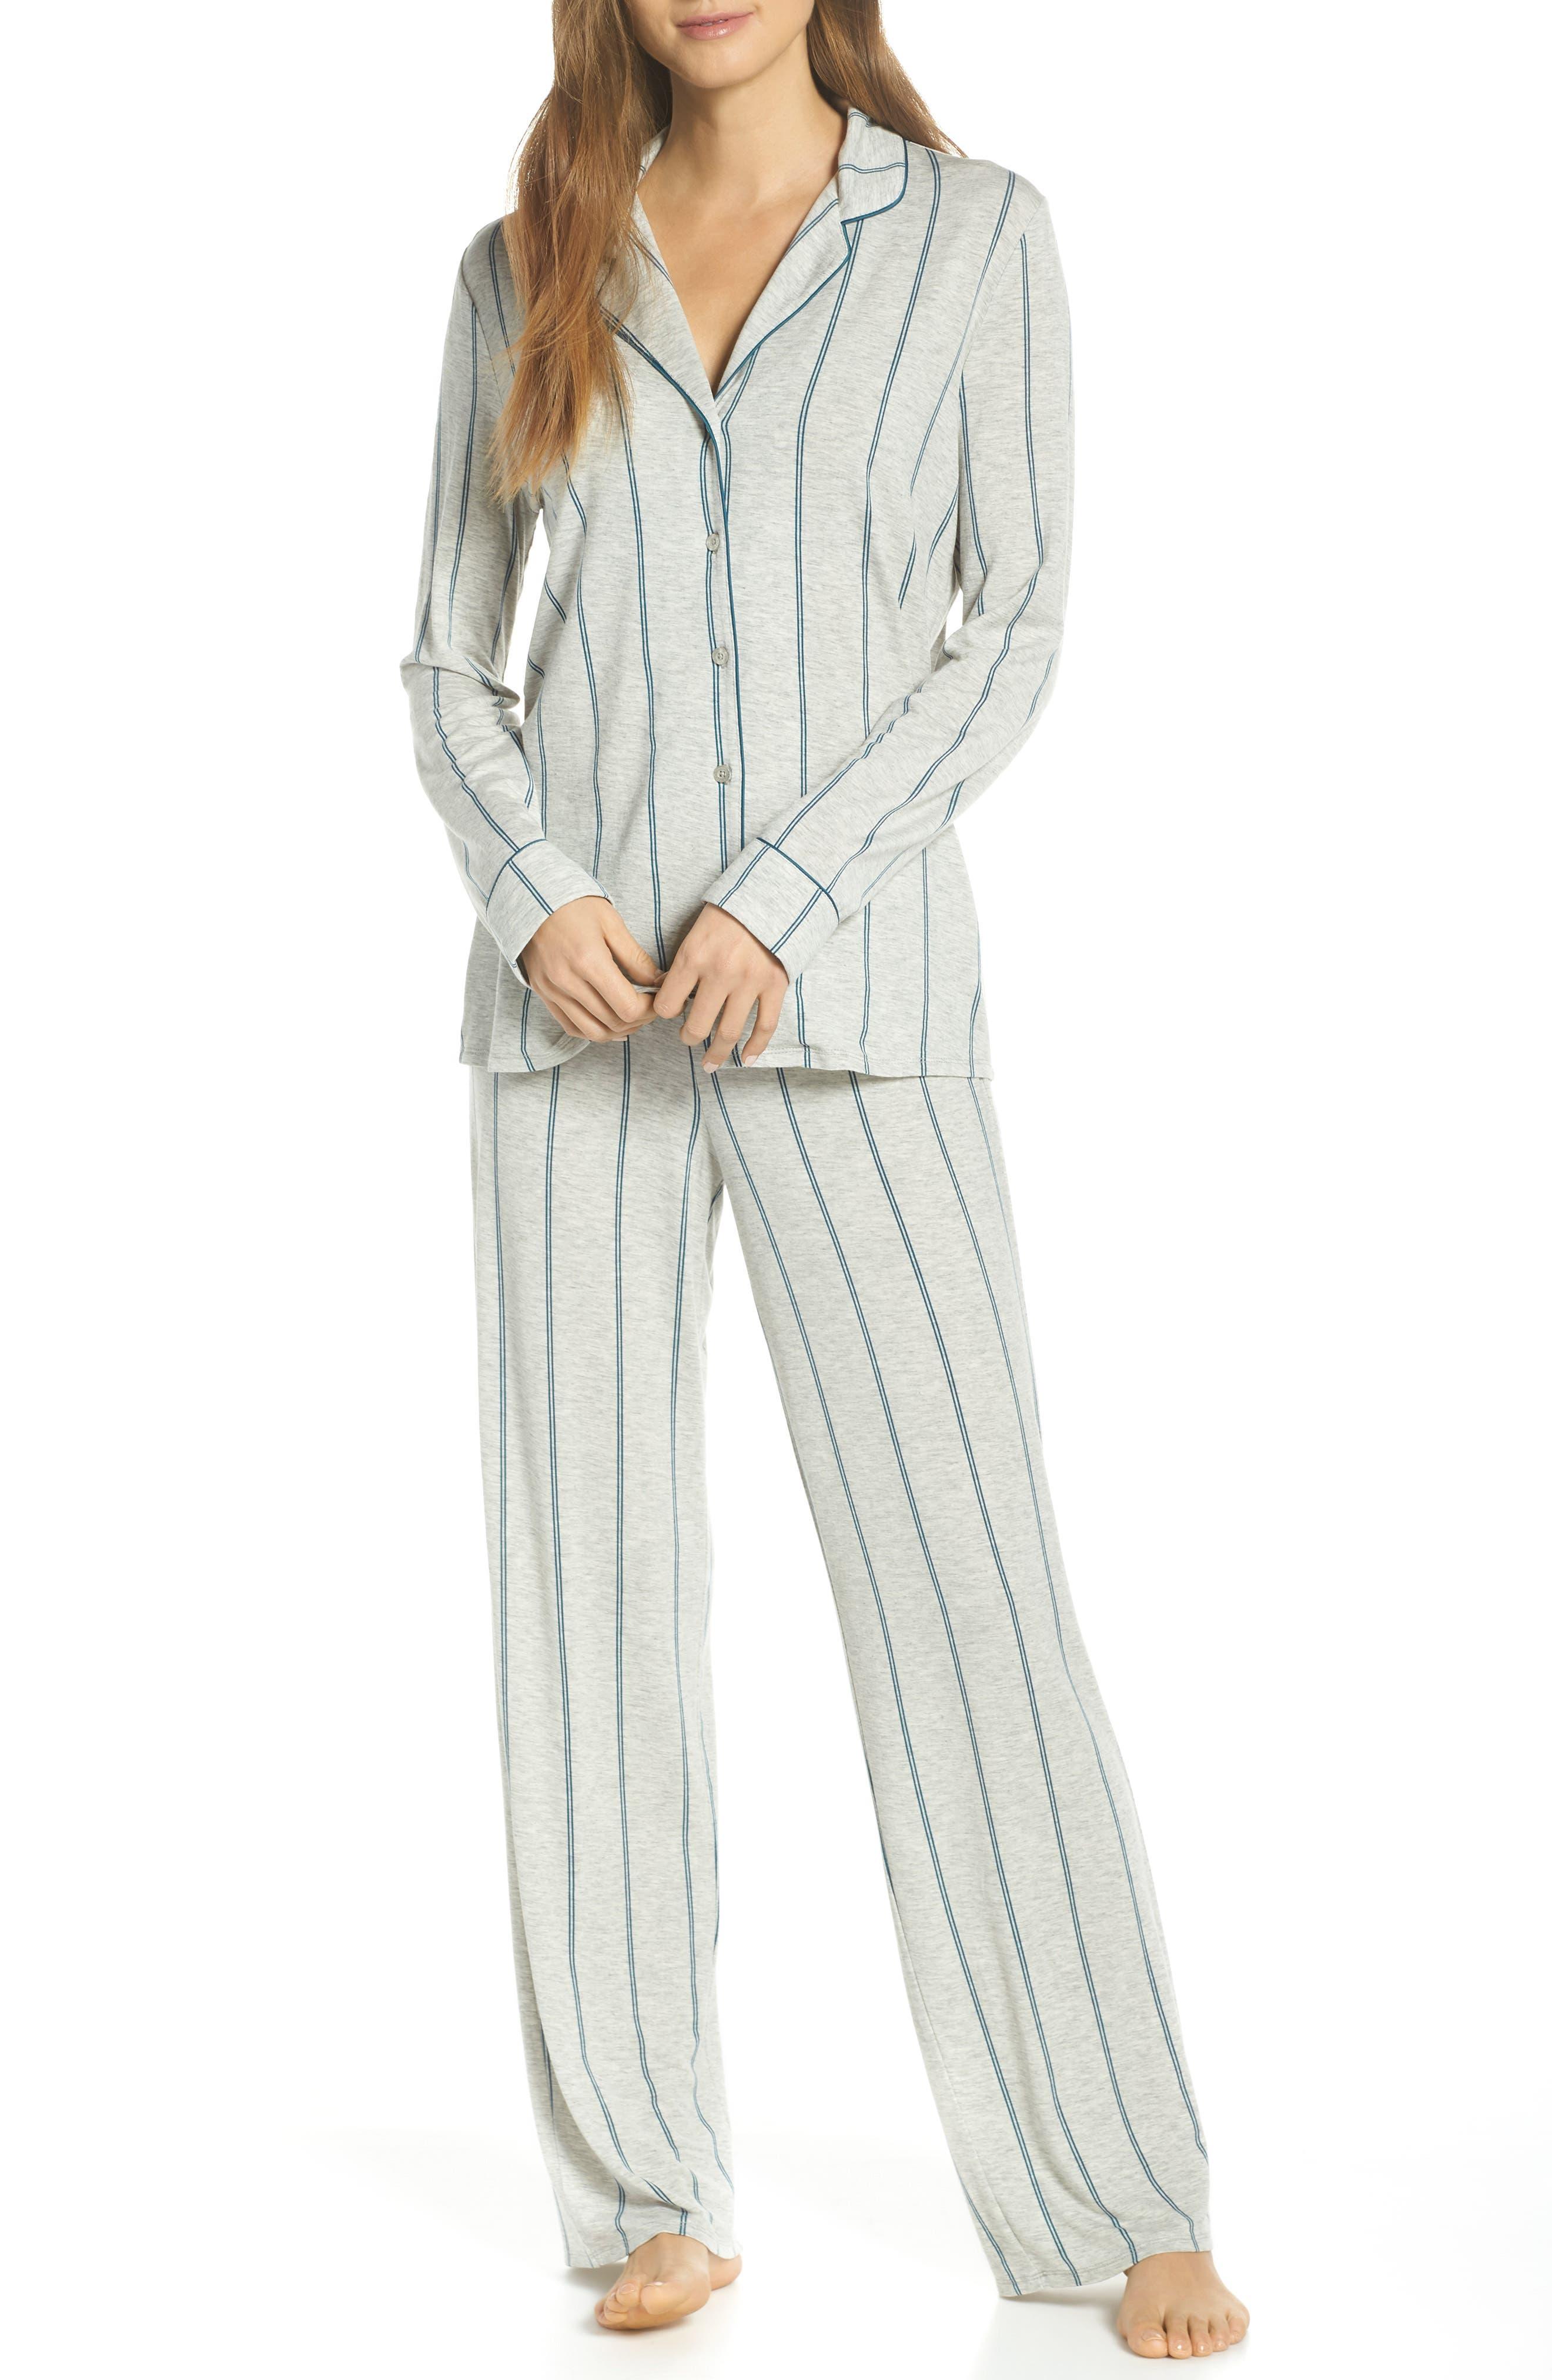 NORDSTROM LINGERIE Moonlight Pajamas, Main, color, GREY PEARL HEATHER MICROSTRIPE